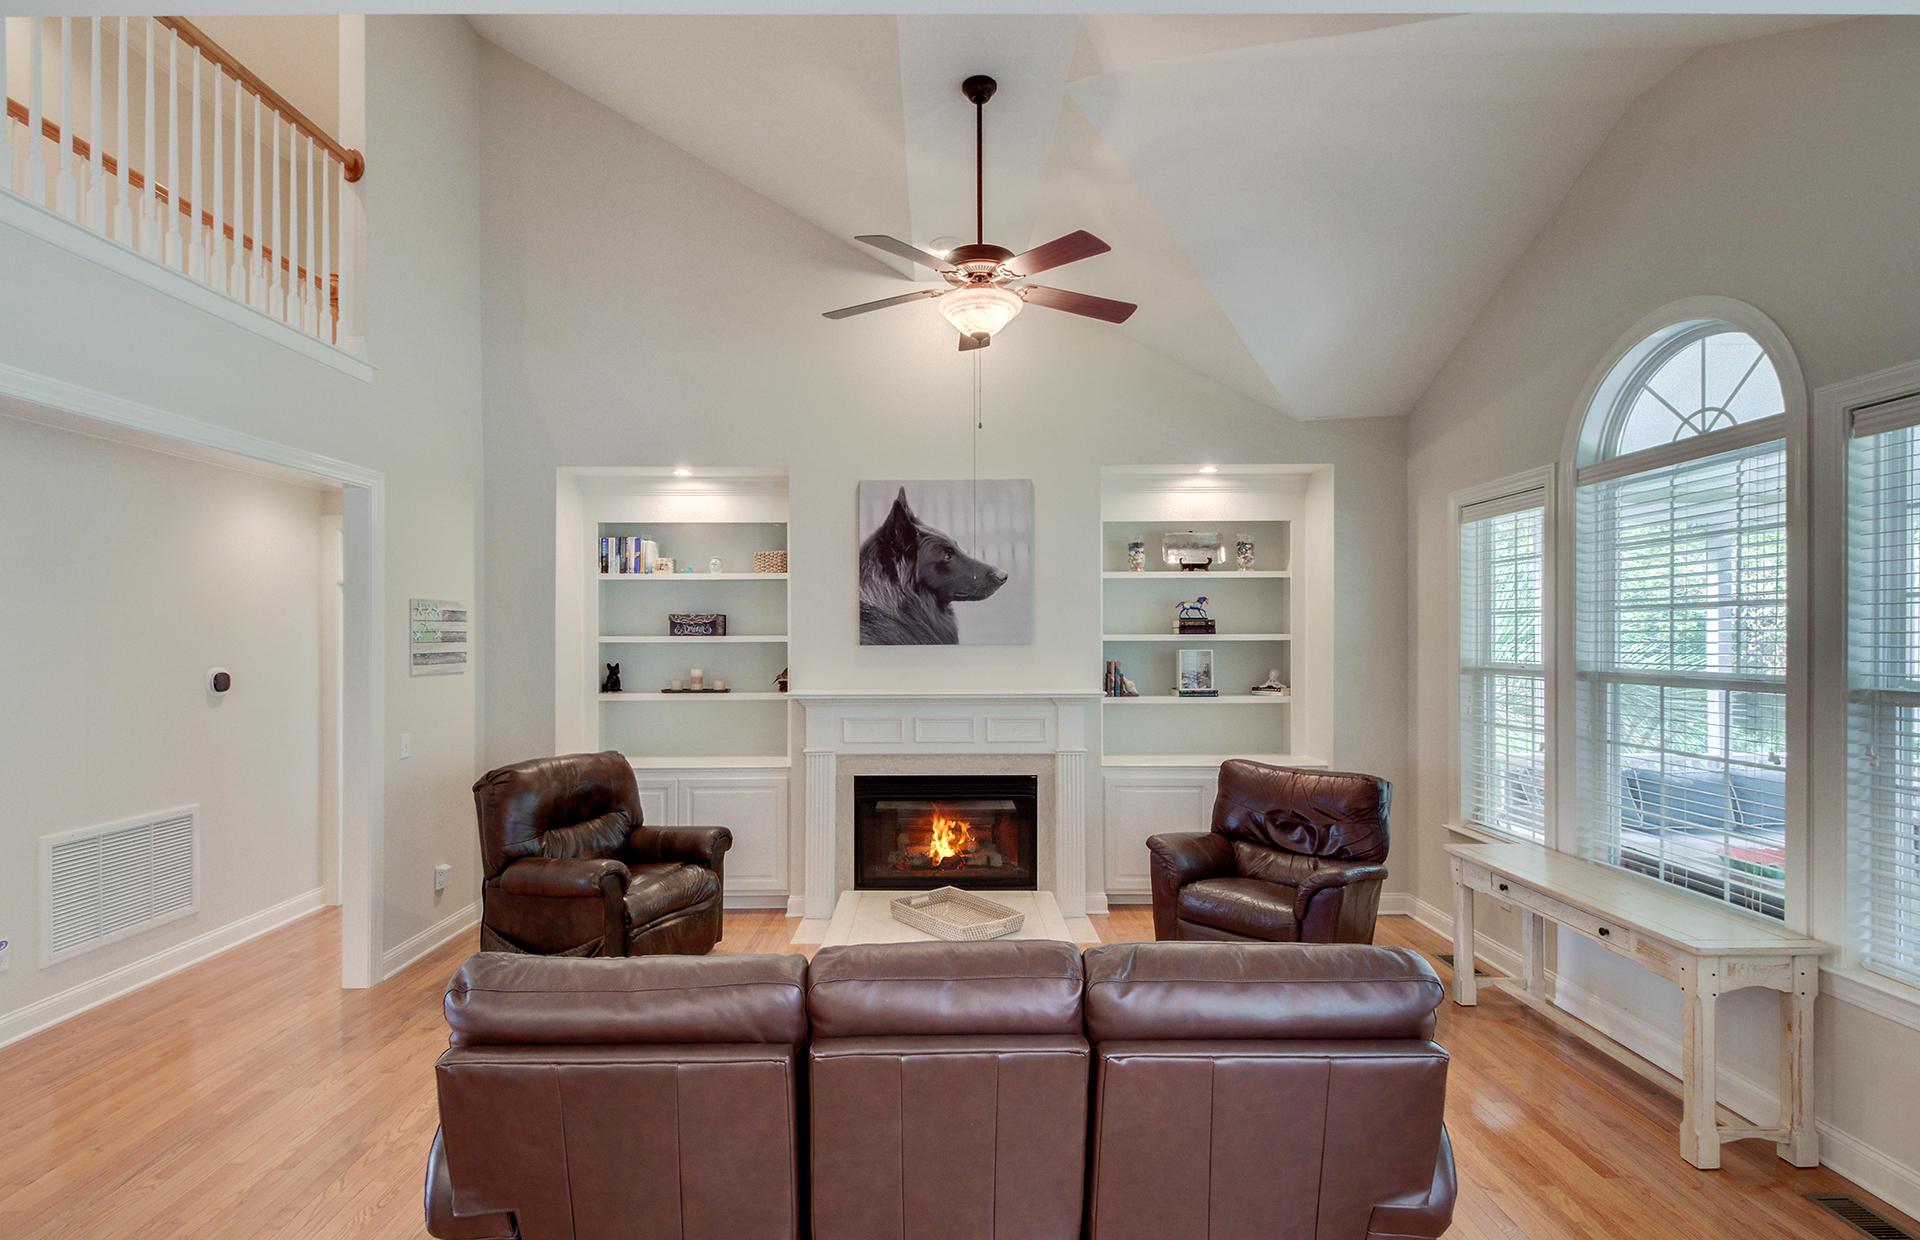 Dunes West Homes For Sale - 2453 Darts Cove, Mount Pleasant, SC - 24